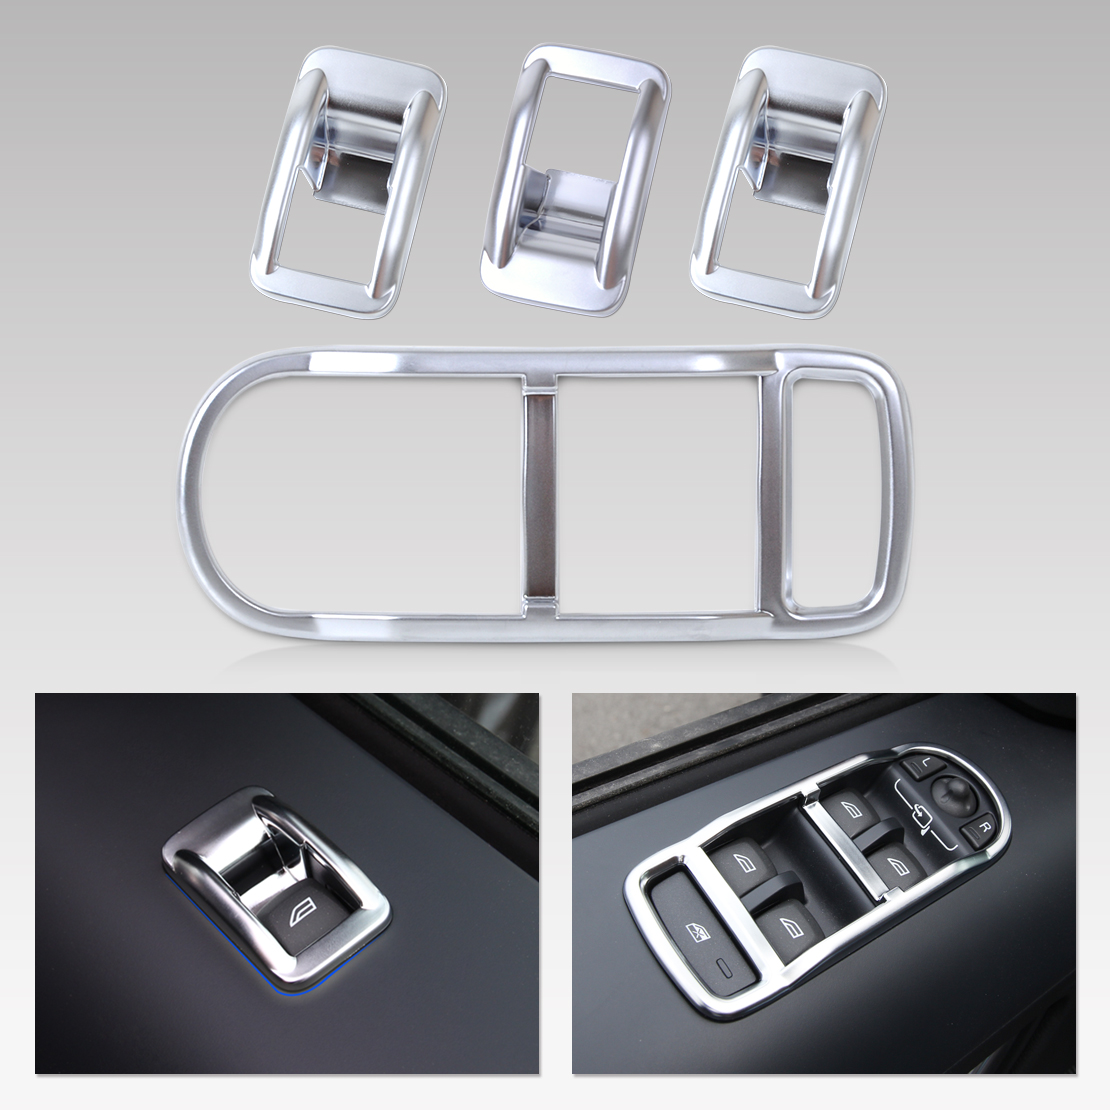 2010 Land Rover Lr2 Interior: Beler New 4pcs Chrome Interior Door Window Switch Panel